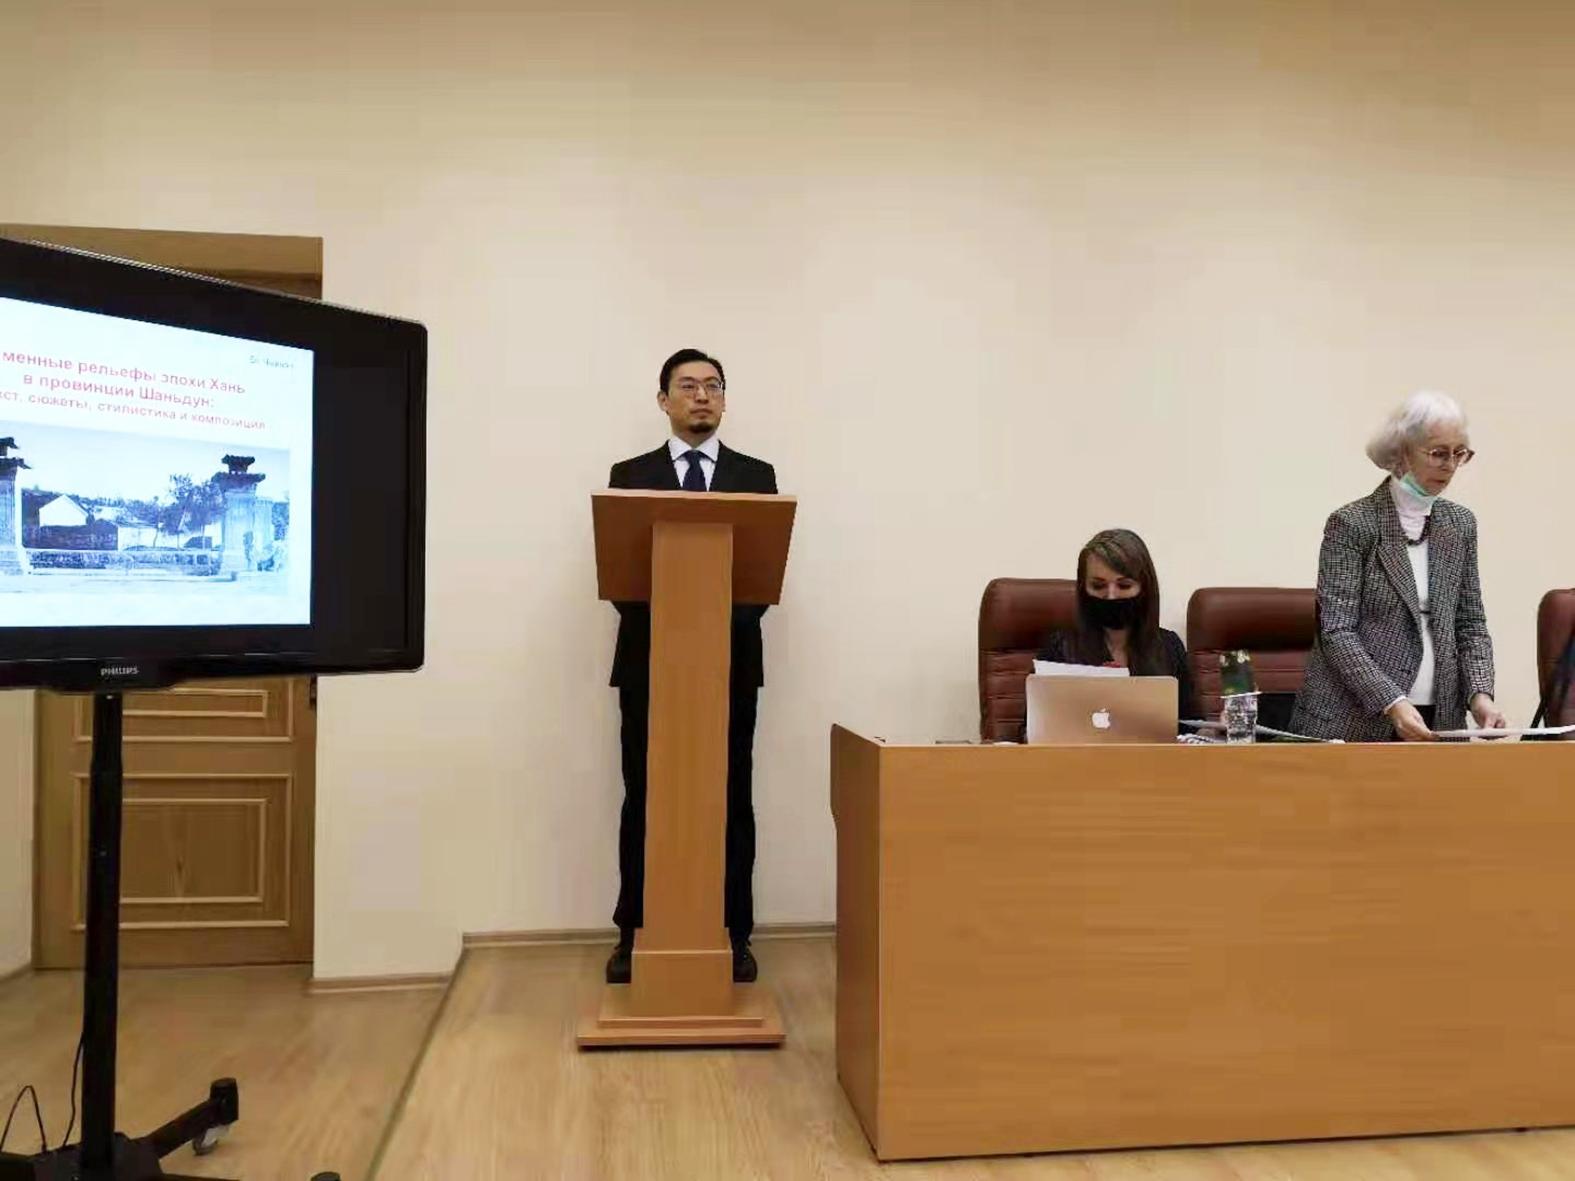 Аспирант Академии Штиглица Би Чжичэн успешно защитил кандидатскую диссертацию